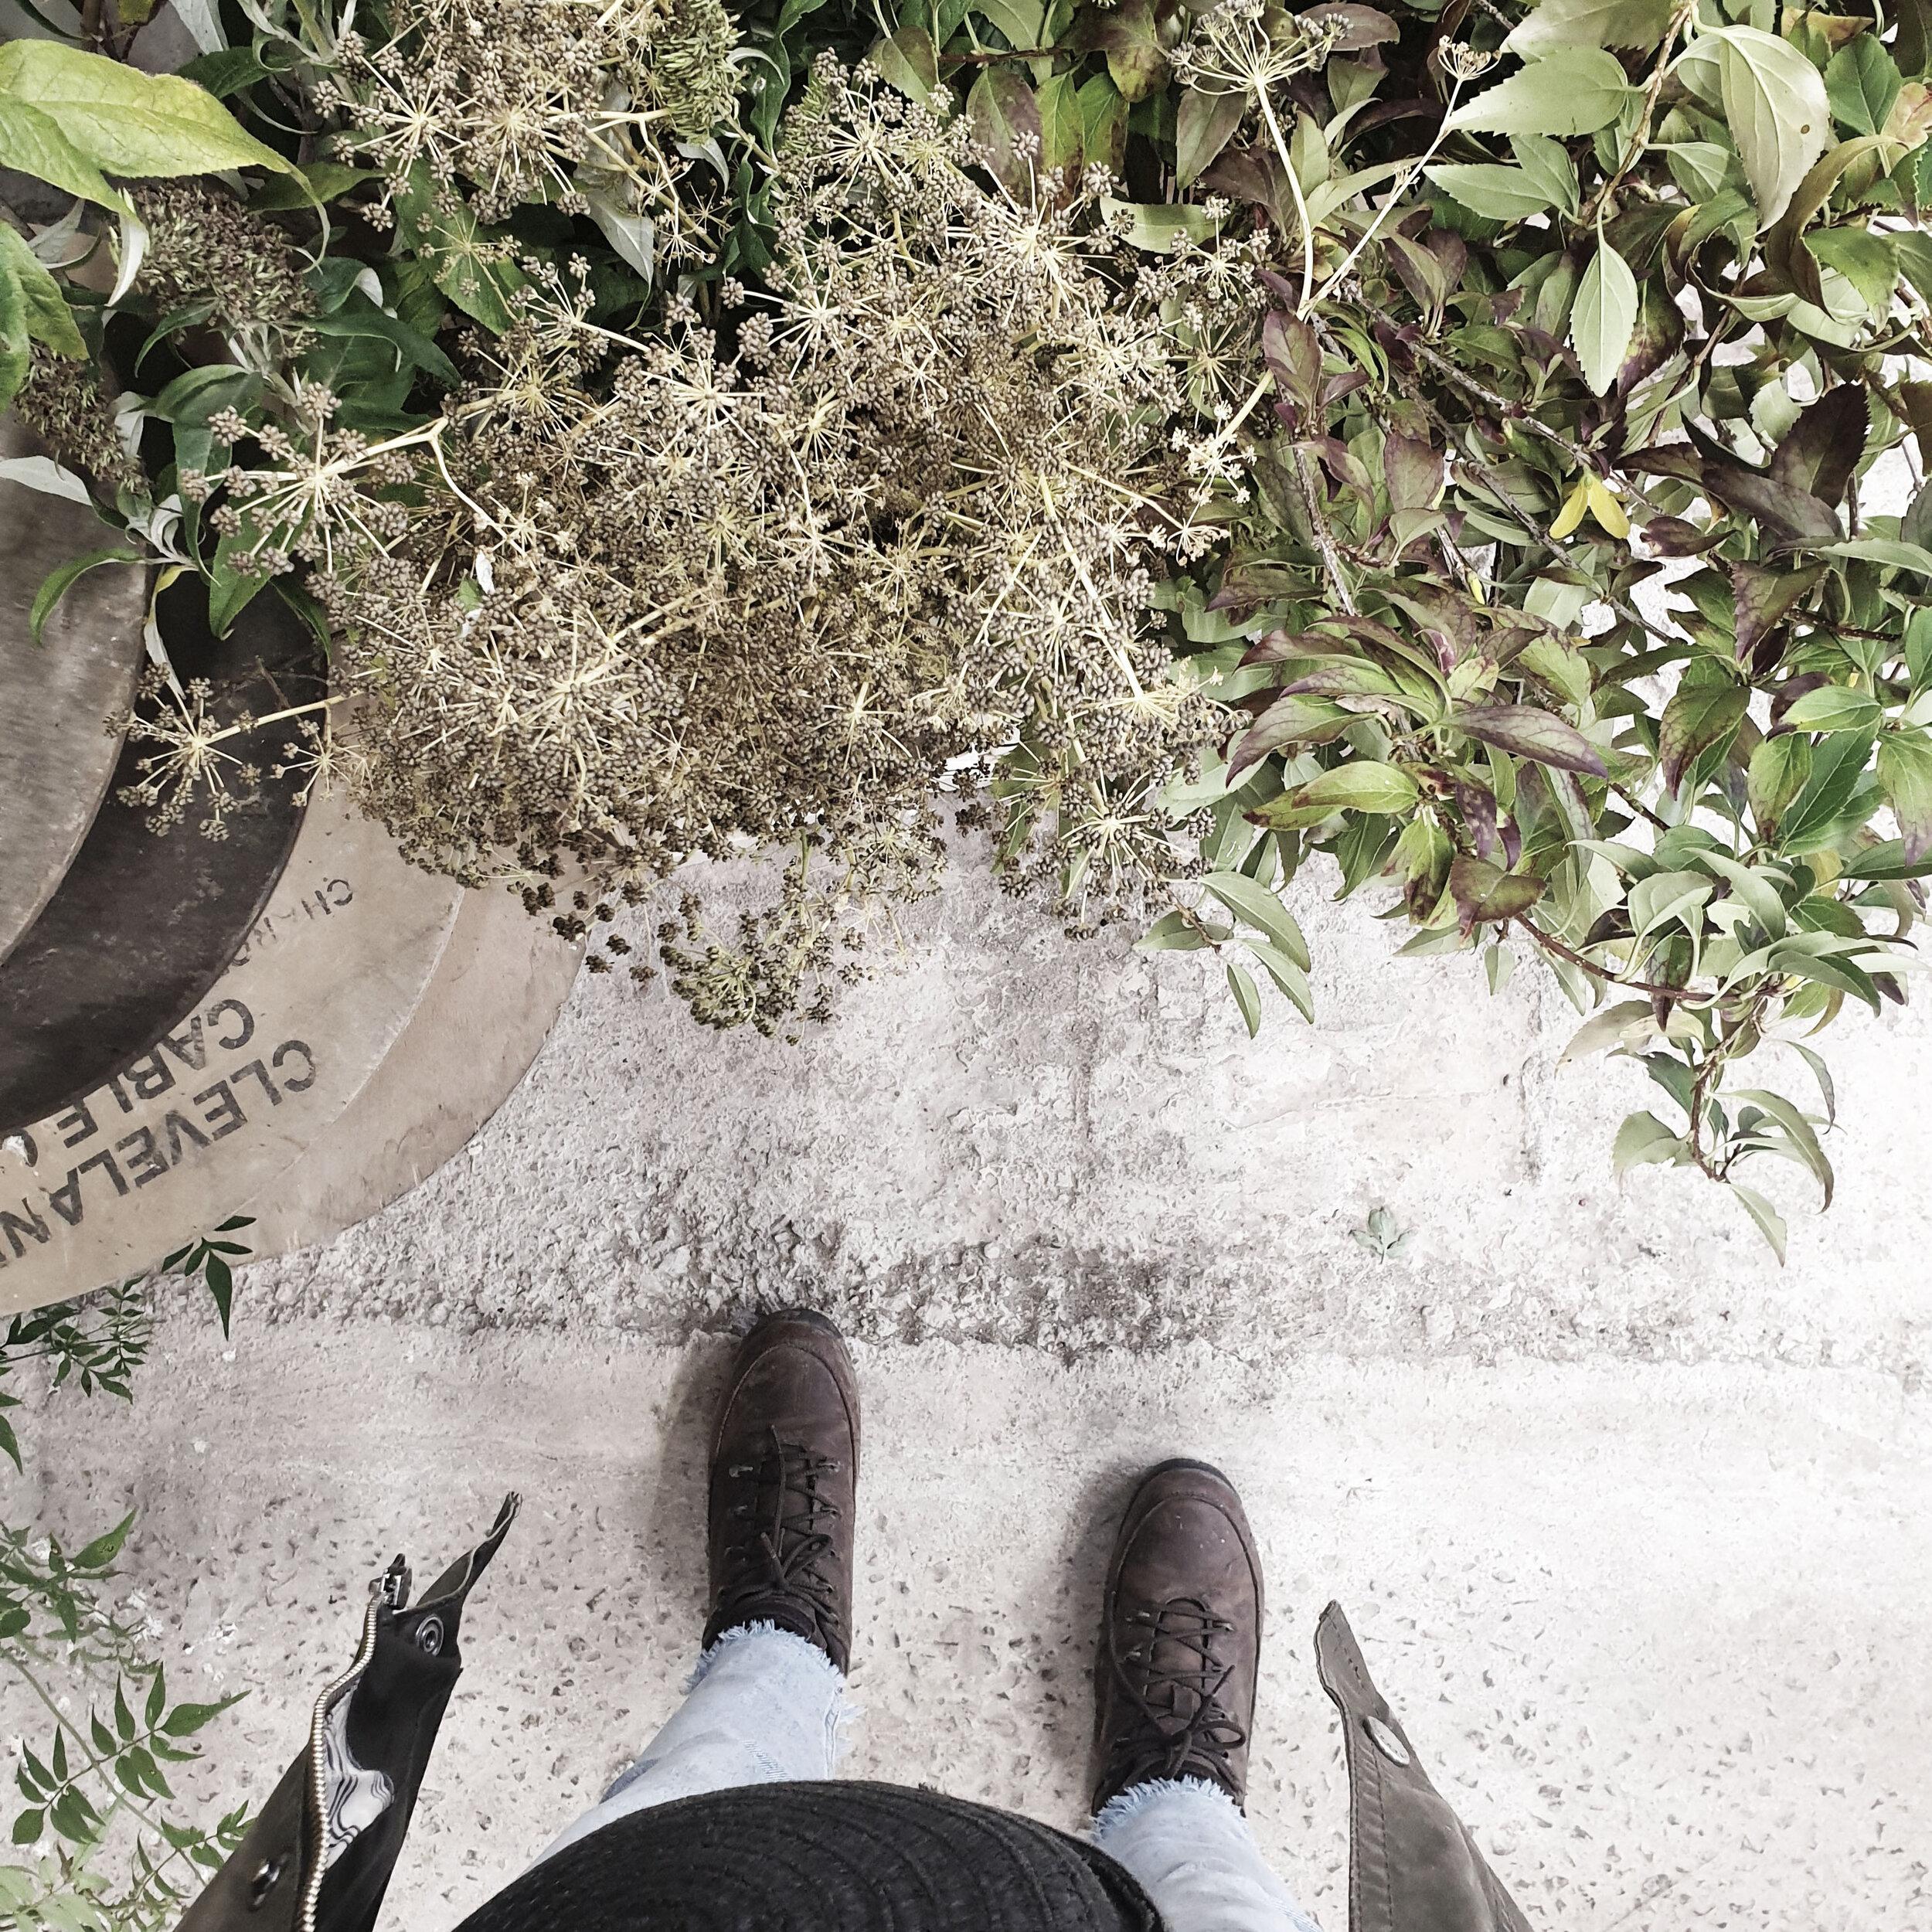 foliage in buckets studio.jpg